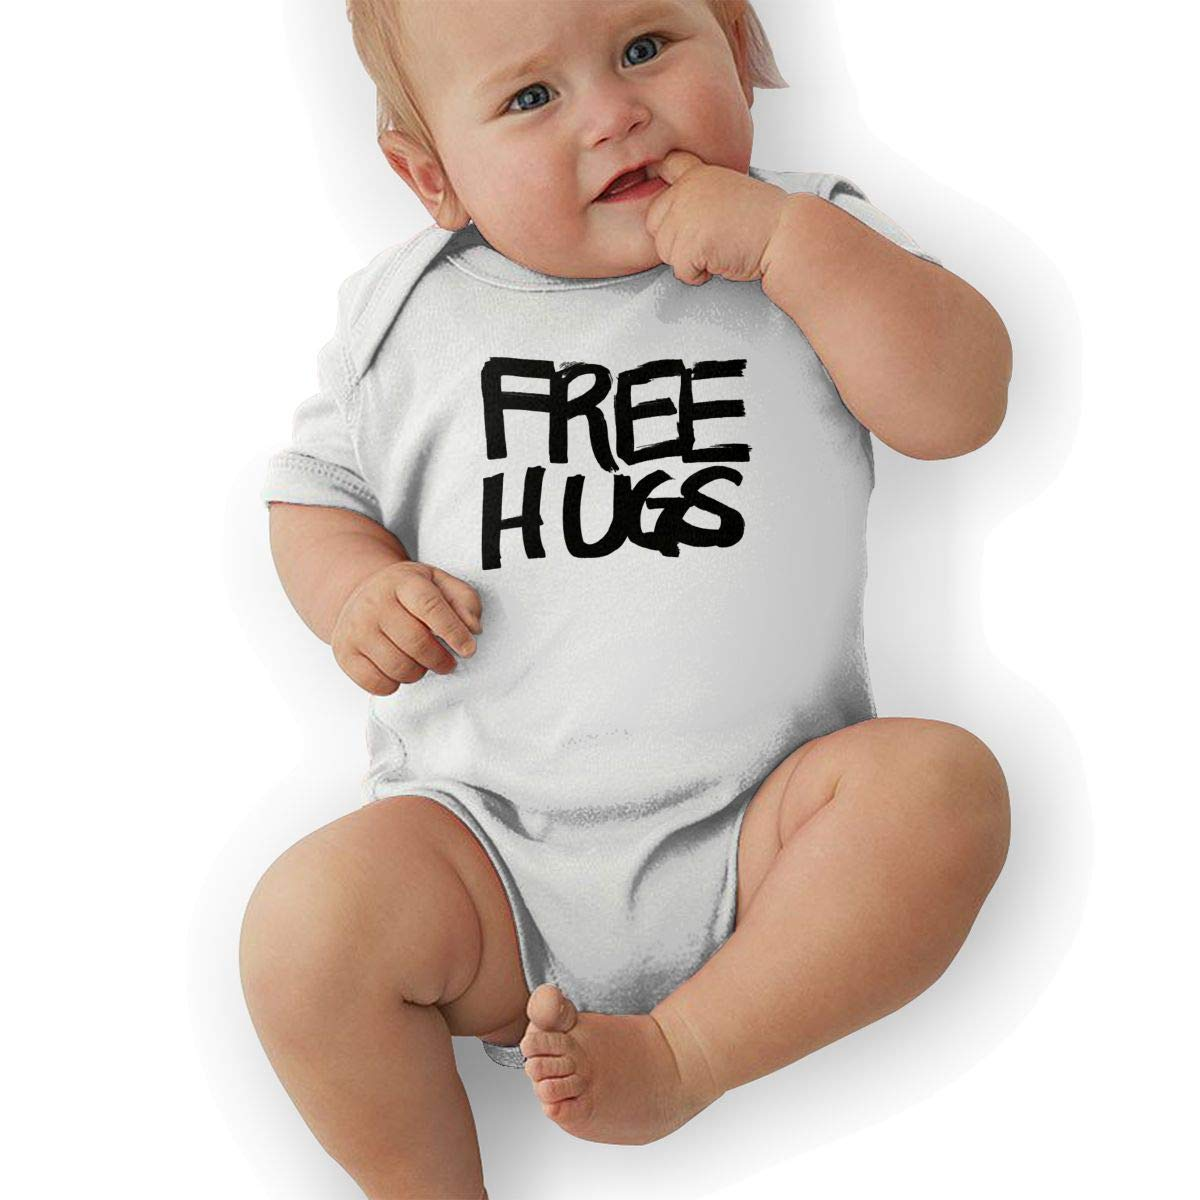 Toddler Baby Boys Bodysuit Short-Sleeve Onesie Free Hugs Print Outfit Autumn Pajamas